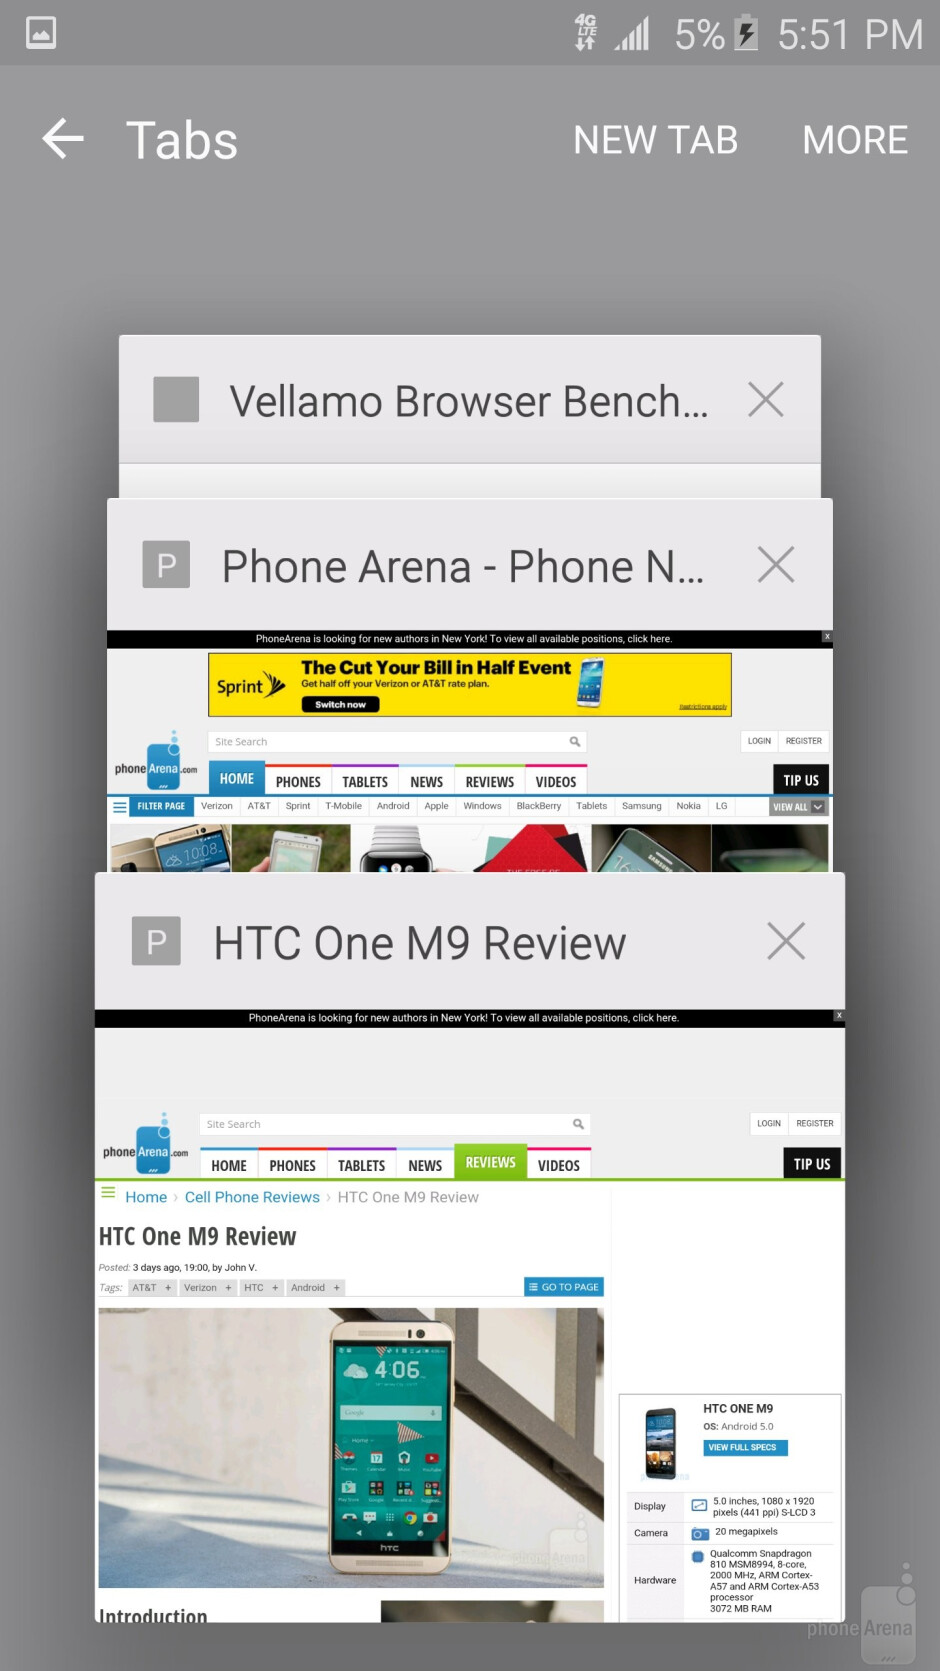 Web browsing - Samsung Galaxy S6 edge vs Apple iPhone 6